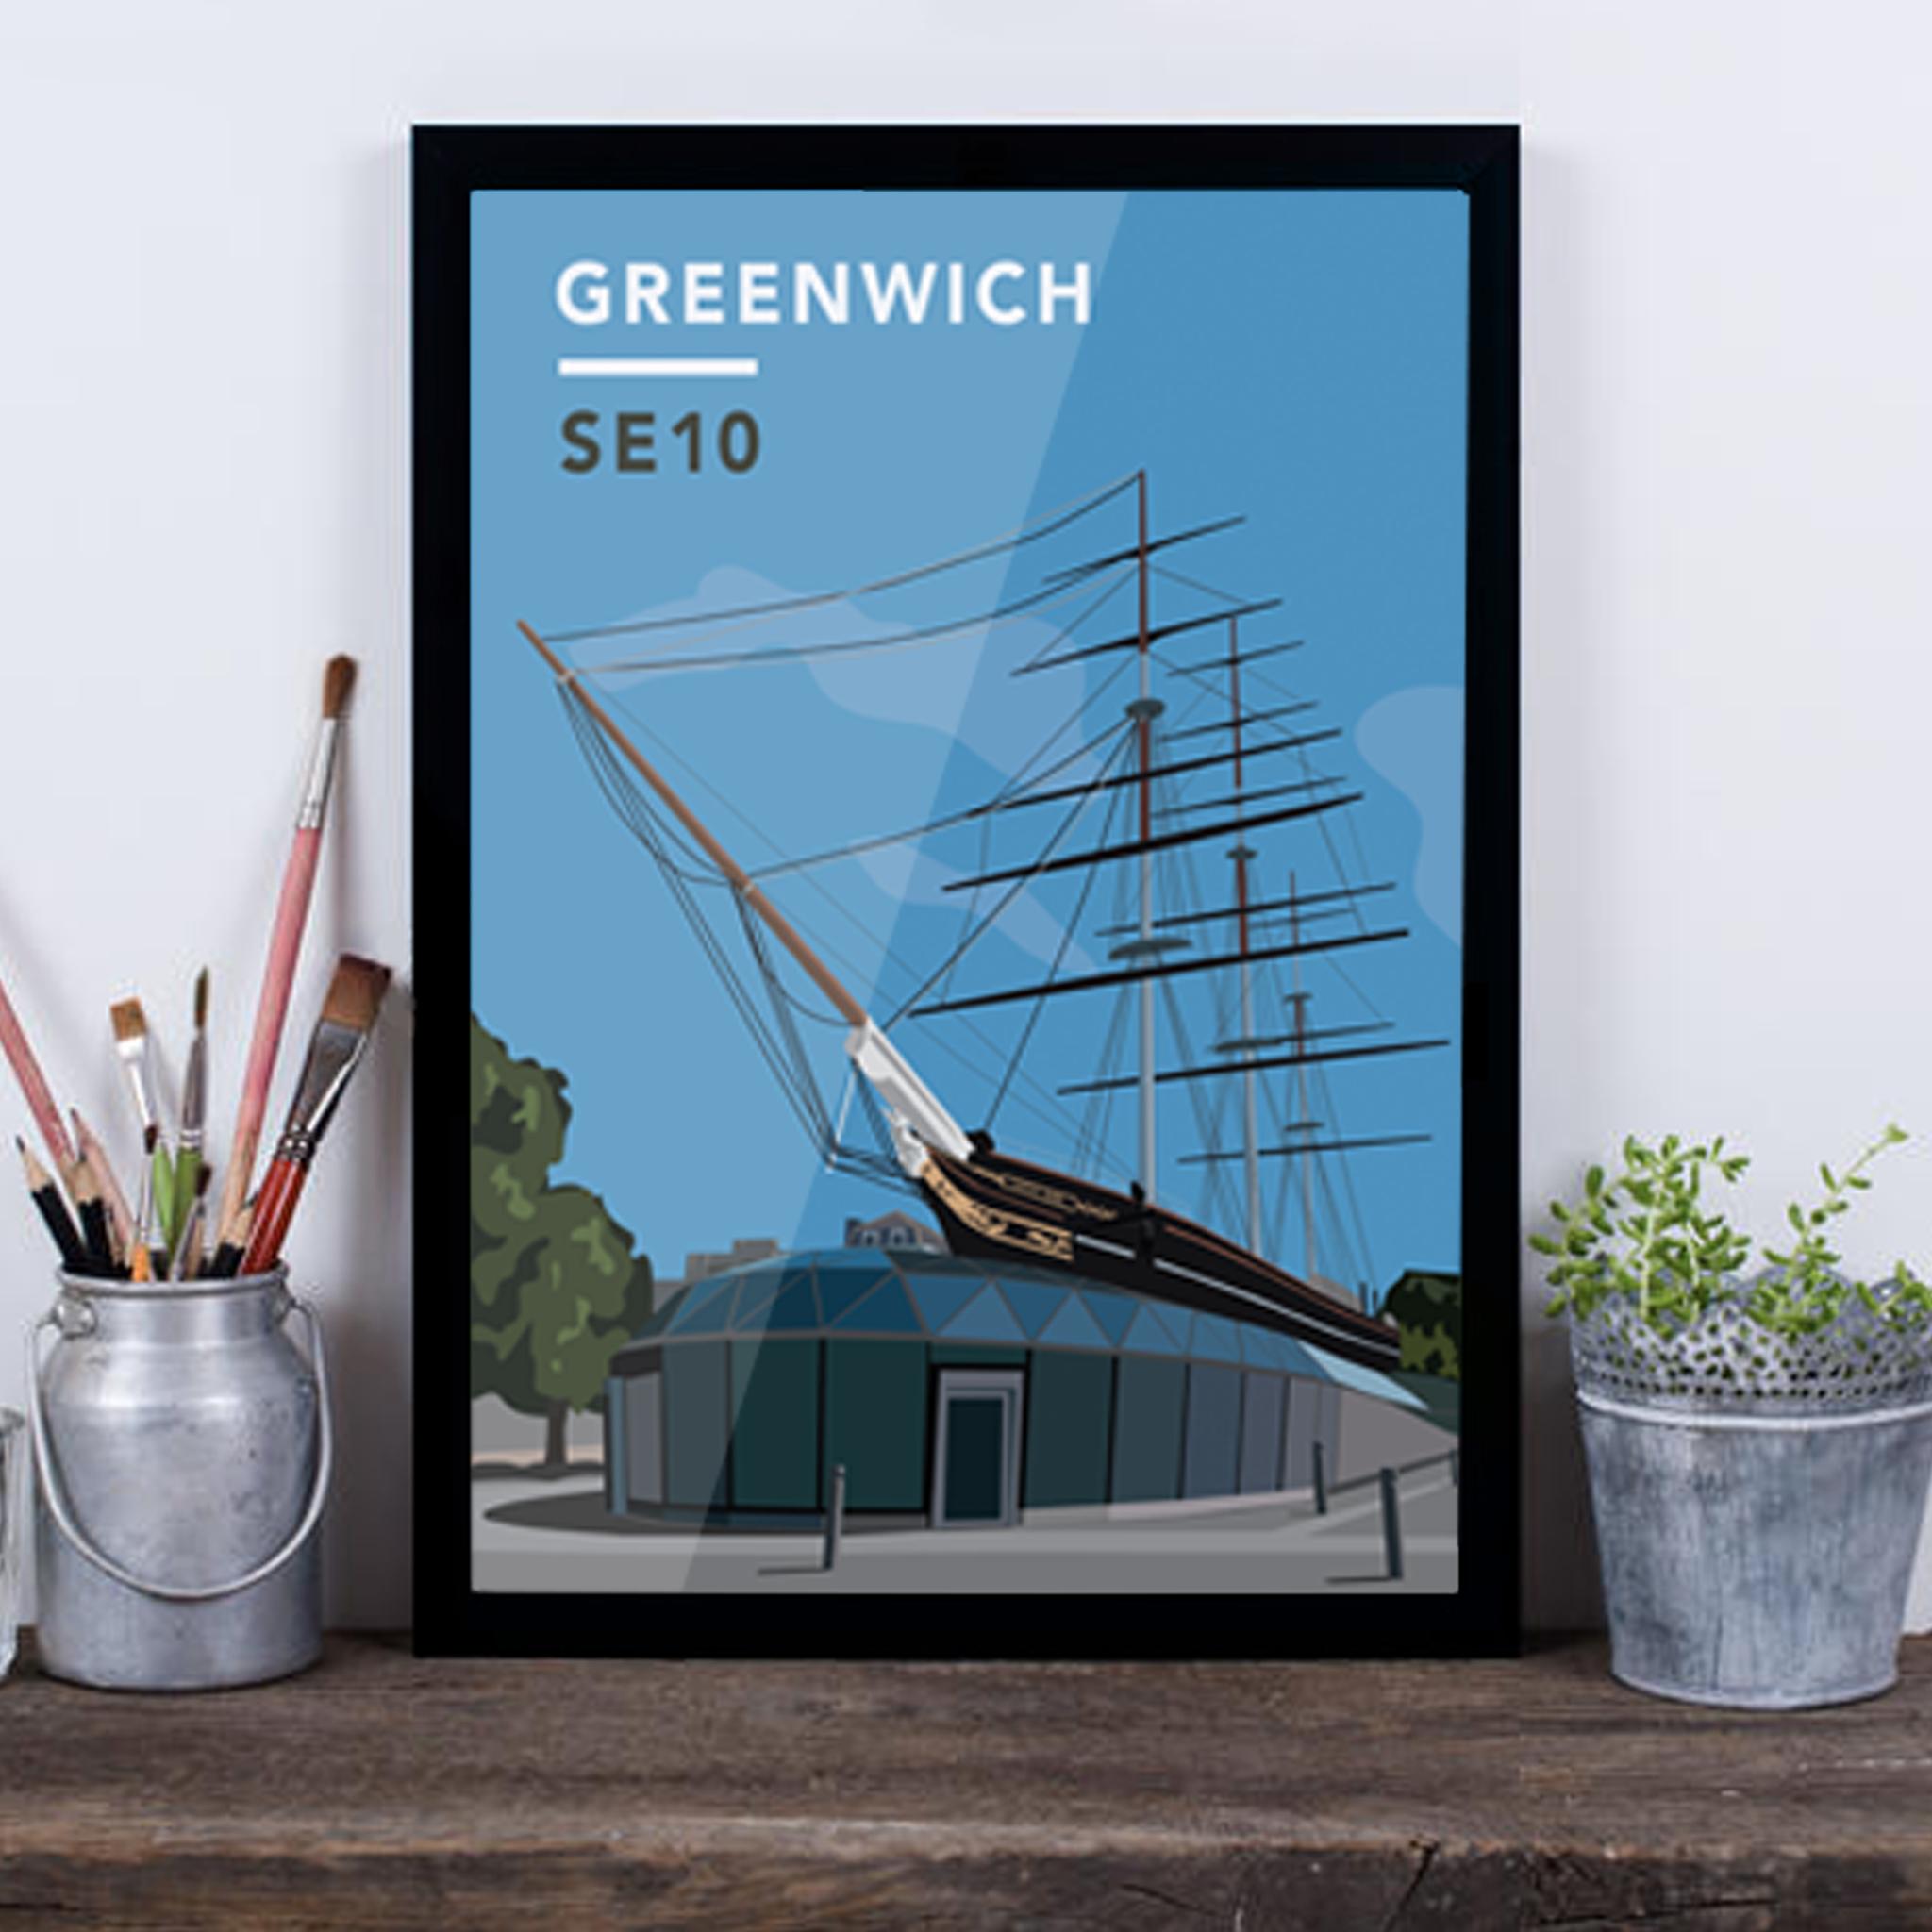 Greenwich Cutty Sark SE10 - Giclée Art Print -